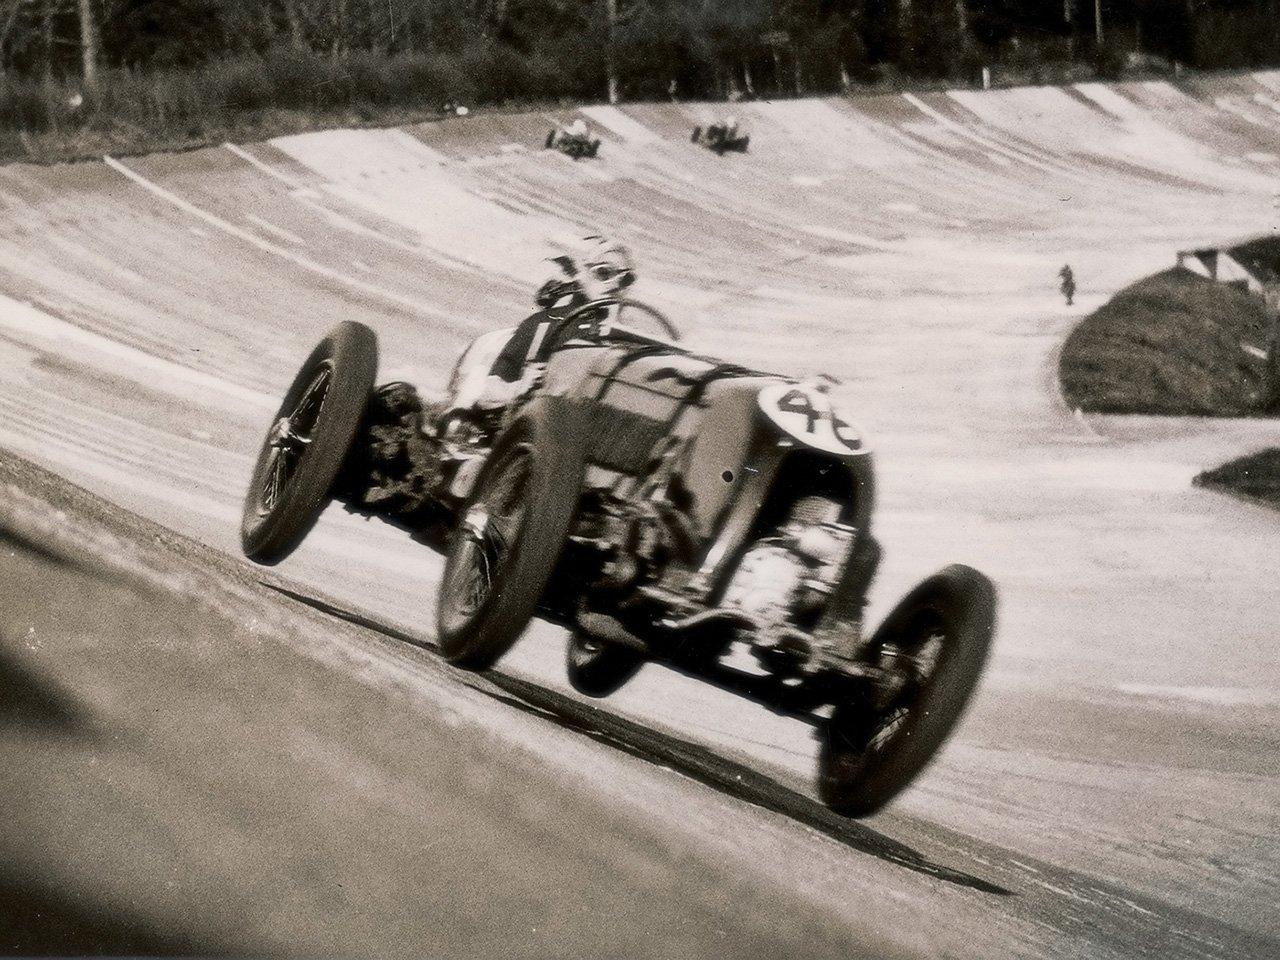 Tim Birkin - Documentary: Full Throttle - The Life of Tim Birkin